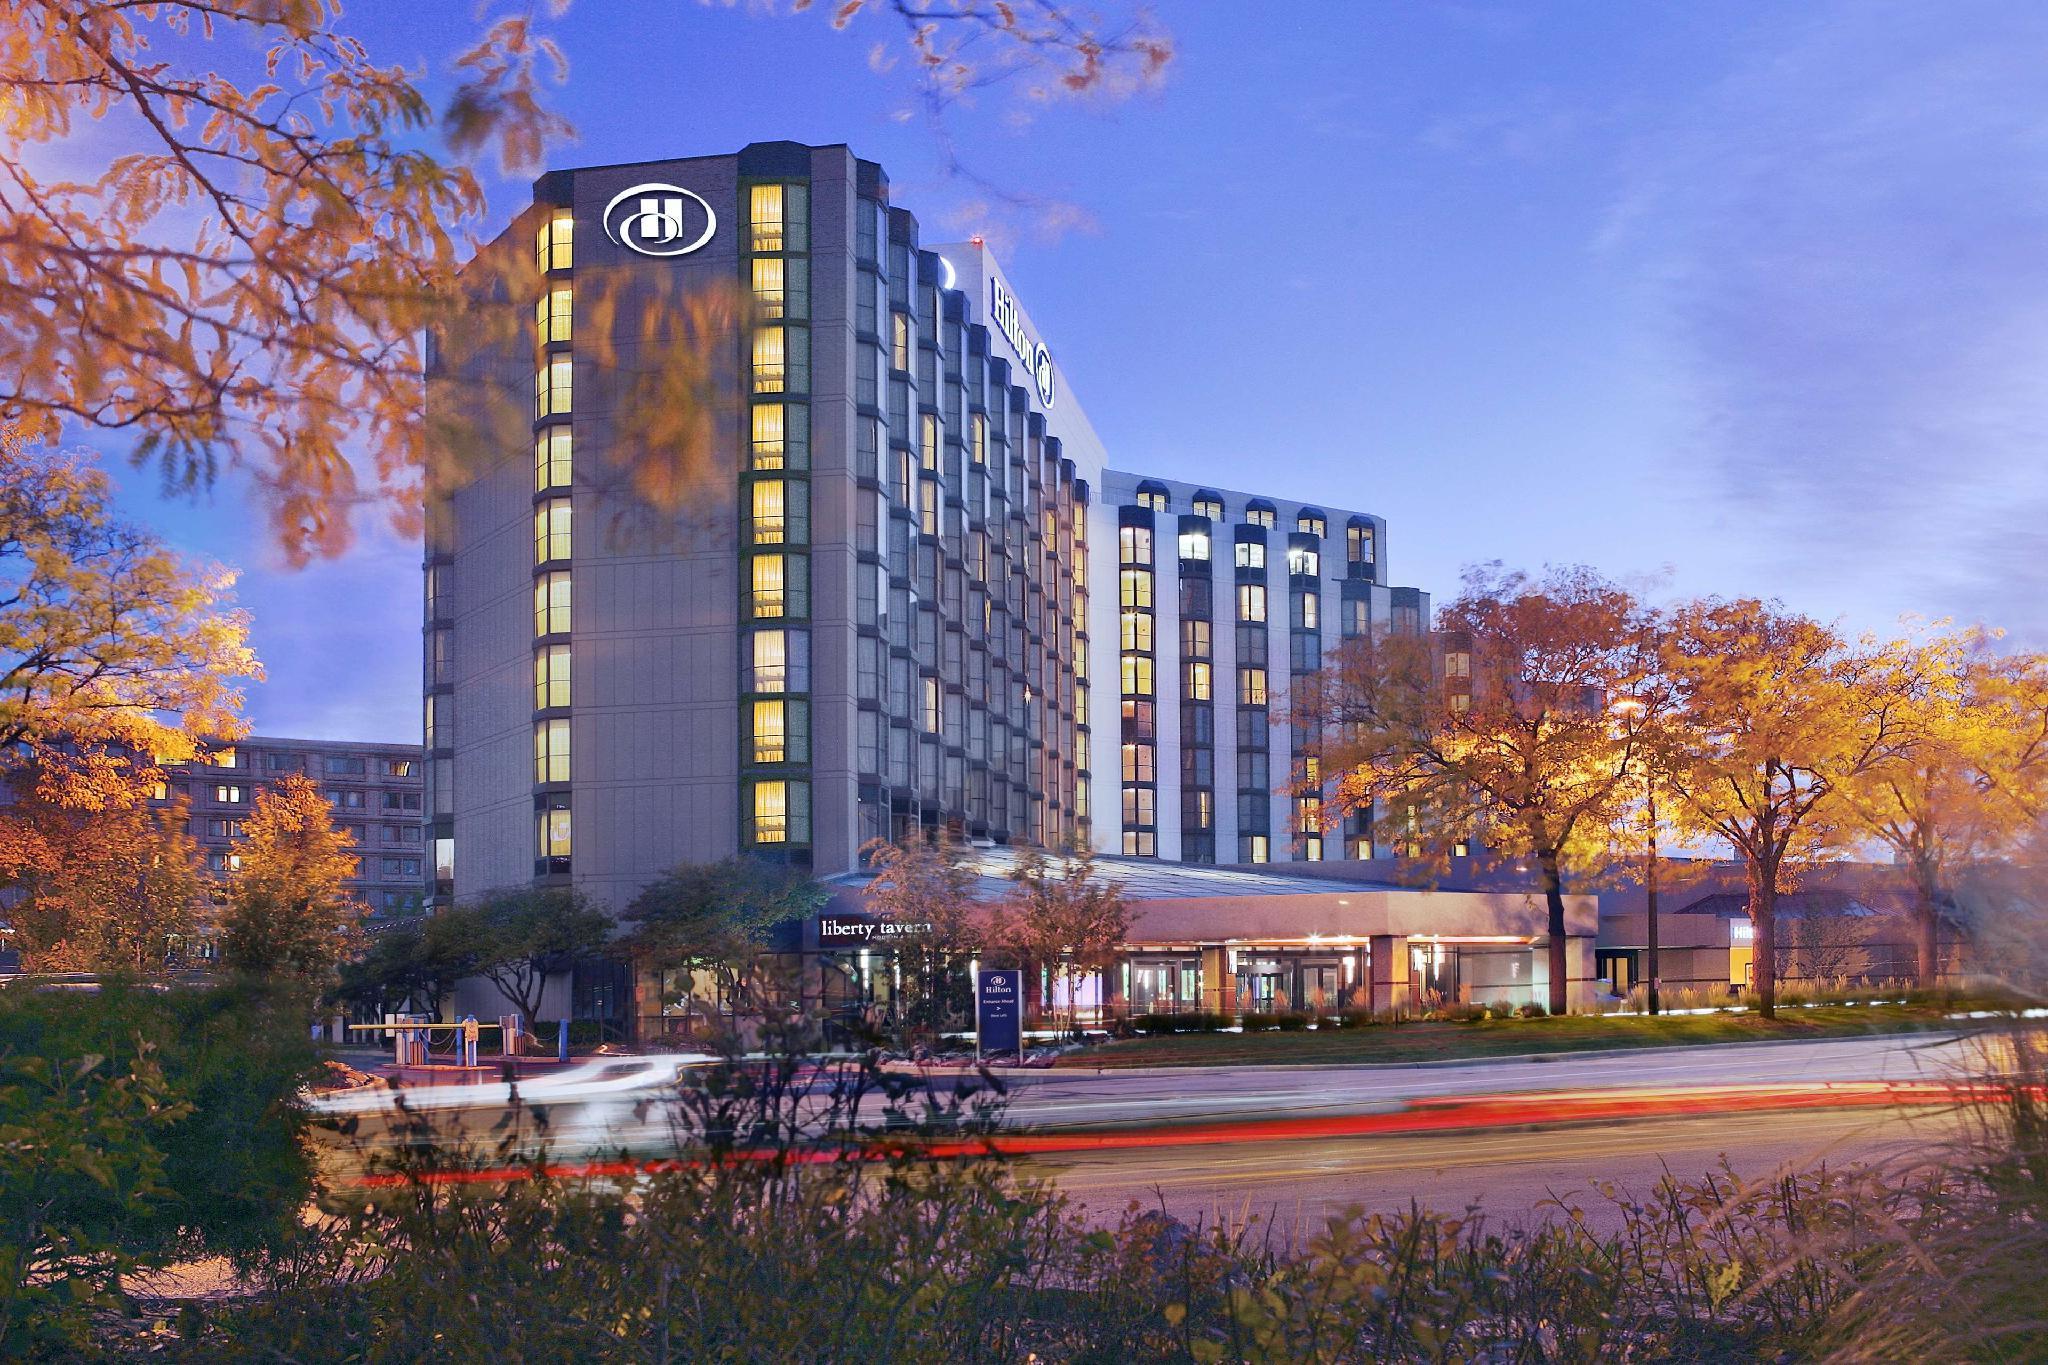 Hilton Rosemont Chicago O'Hare Hotel image